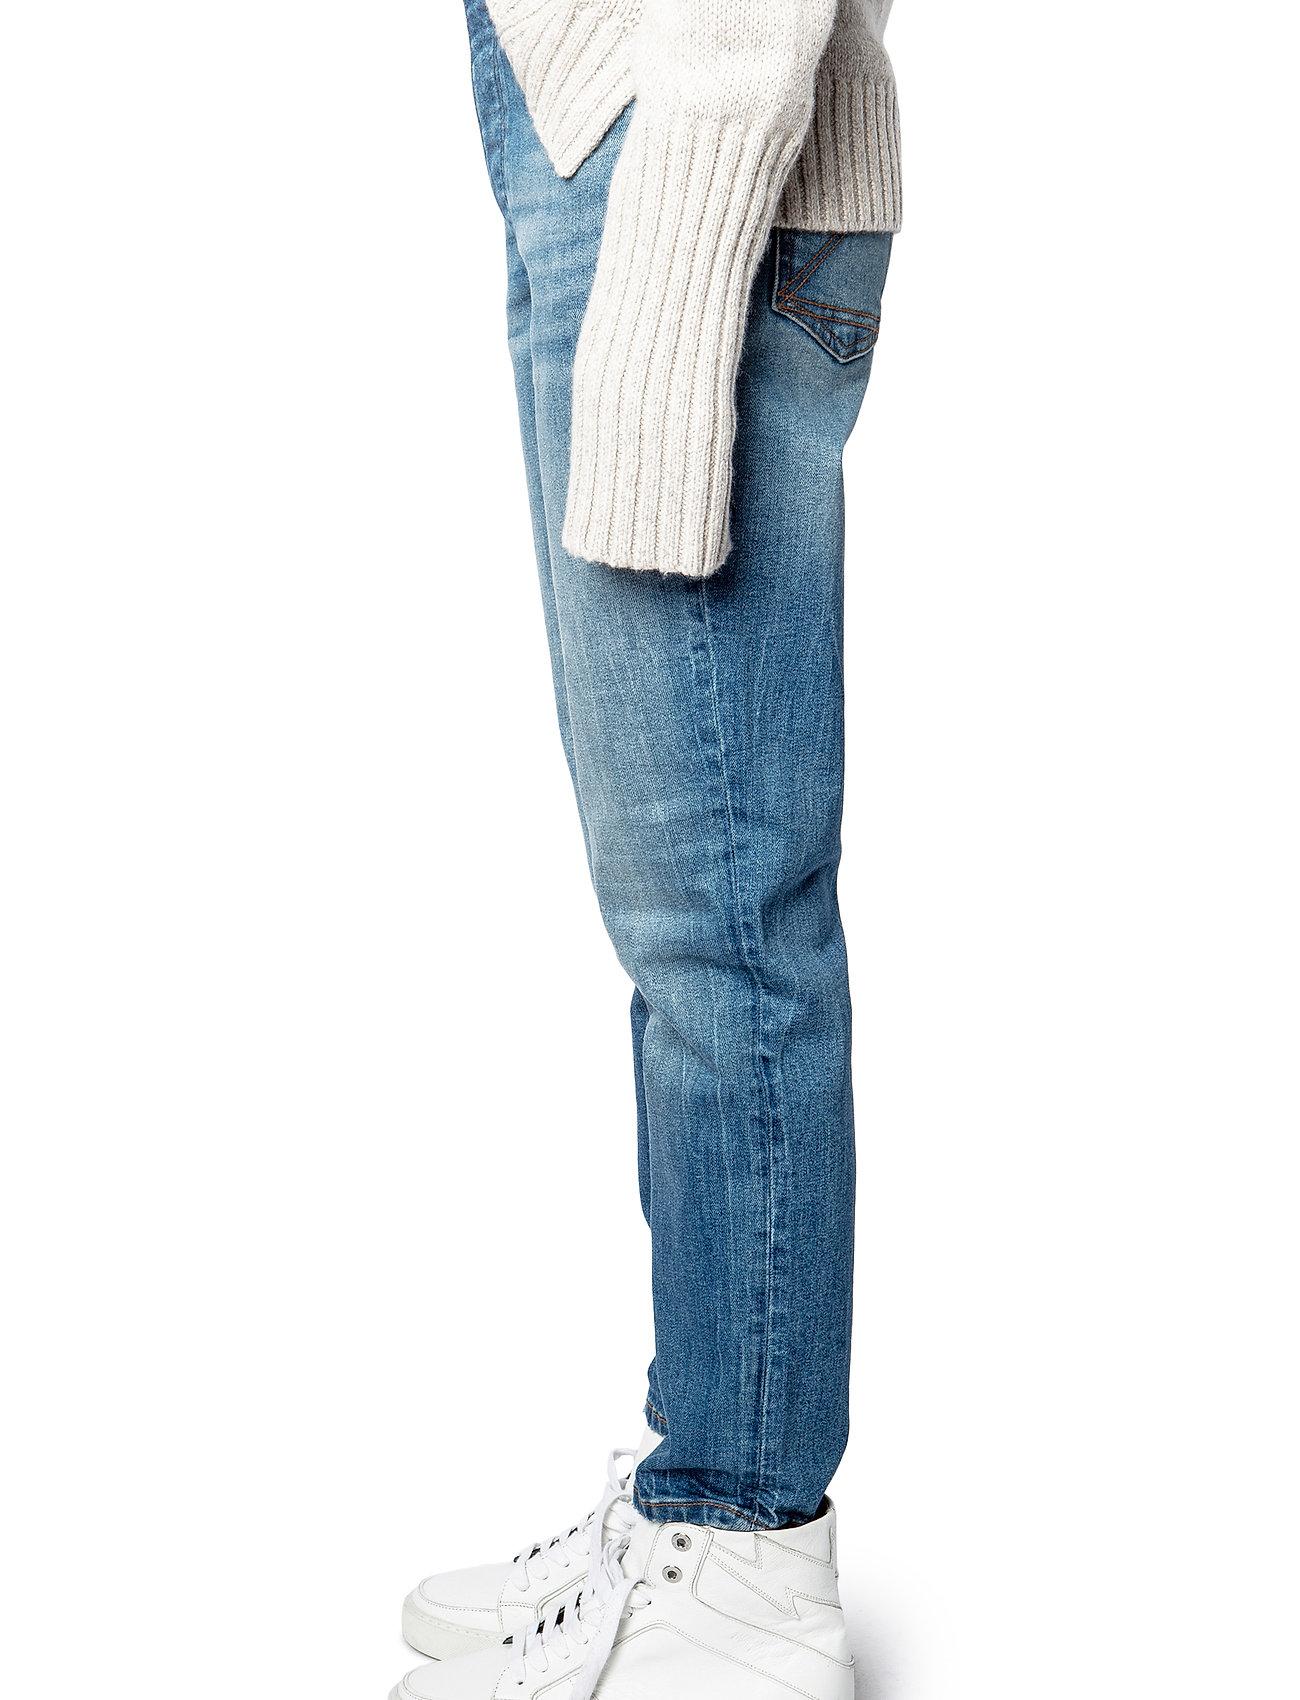 Zadig & Voltaire - MAMMA DENIM ECO LIGHT DENIM - straight jeans - light blue - 7